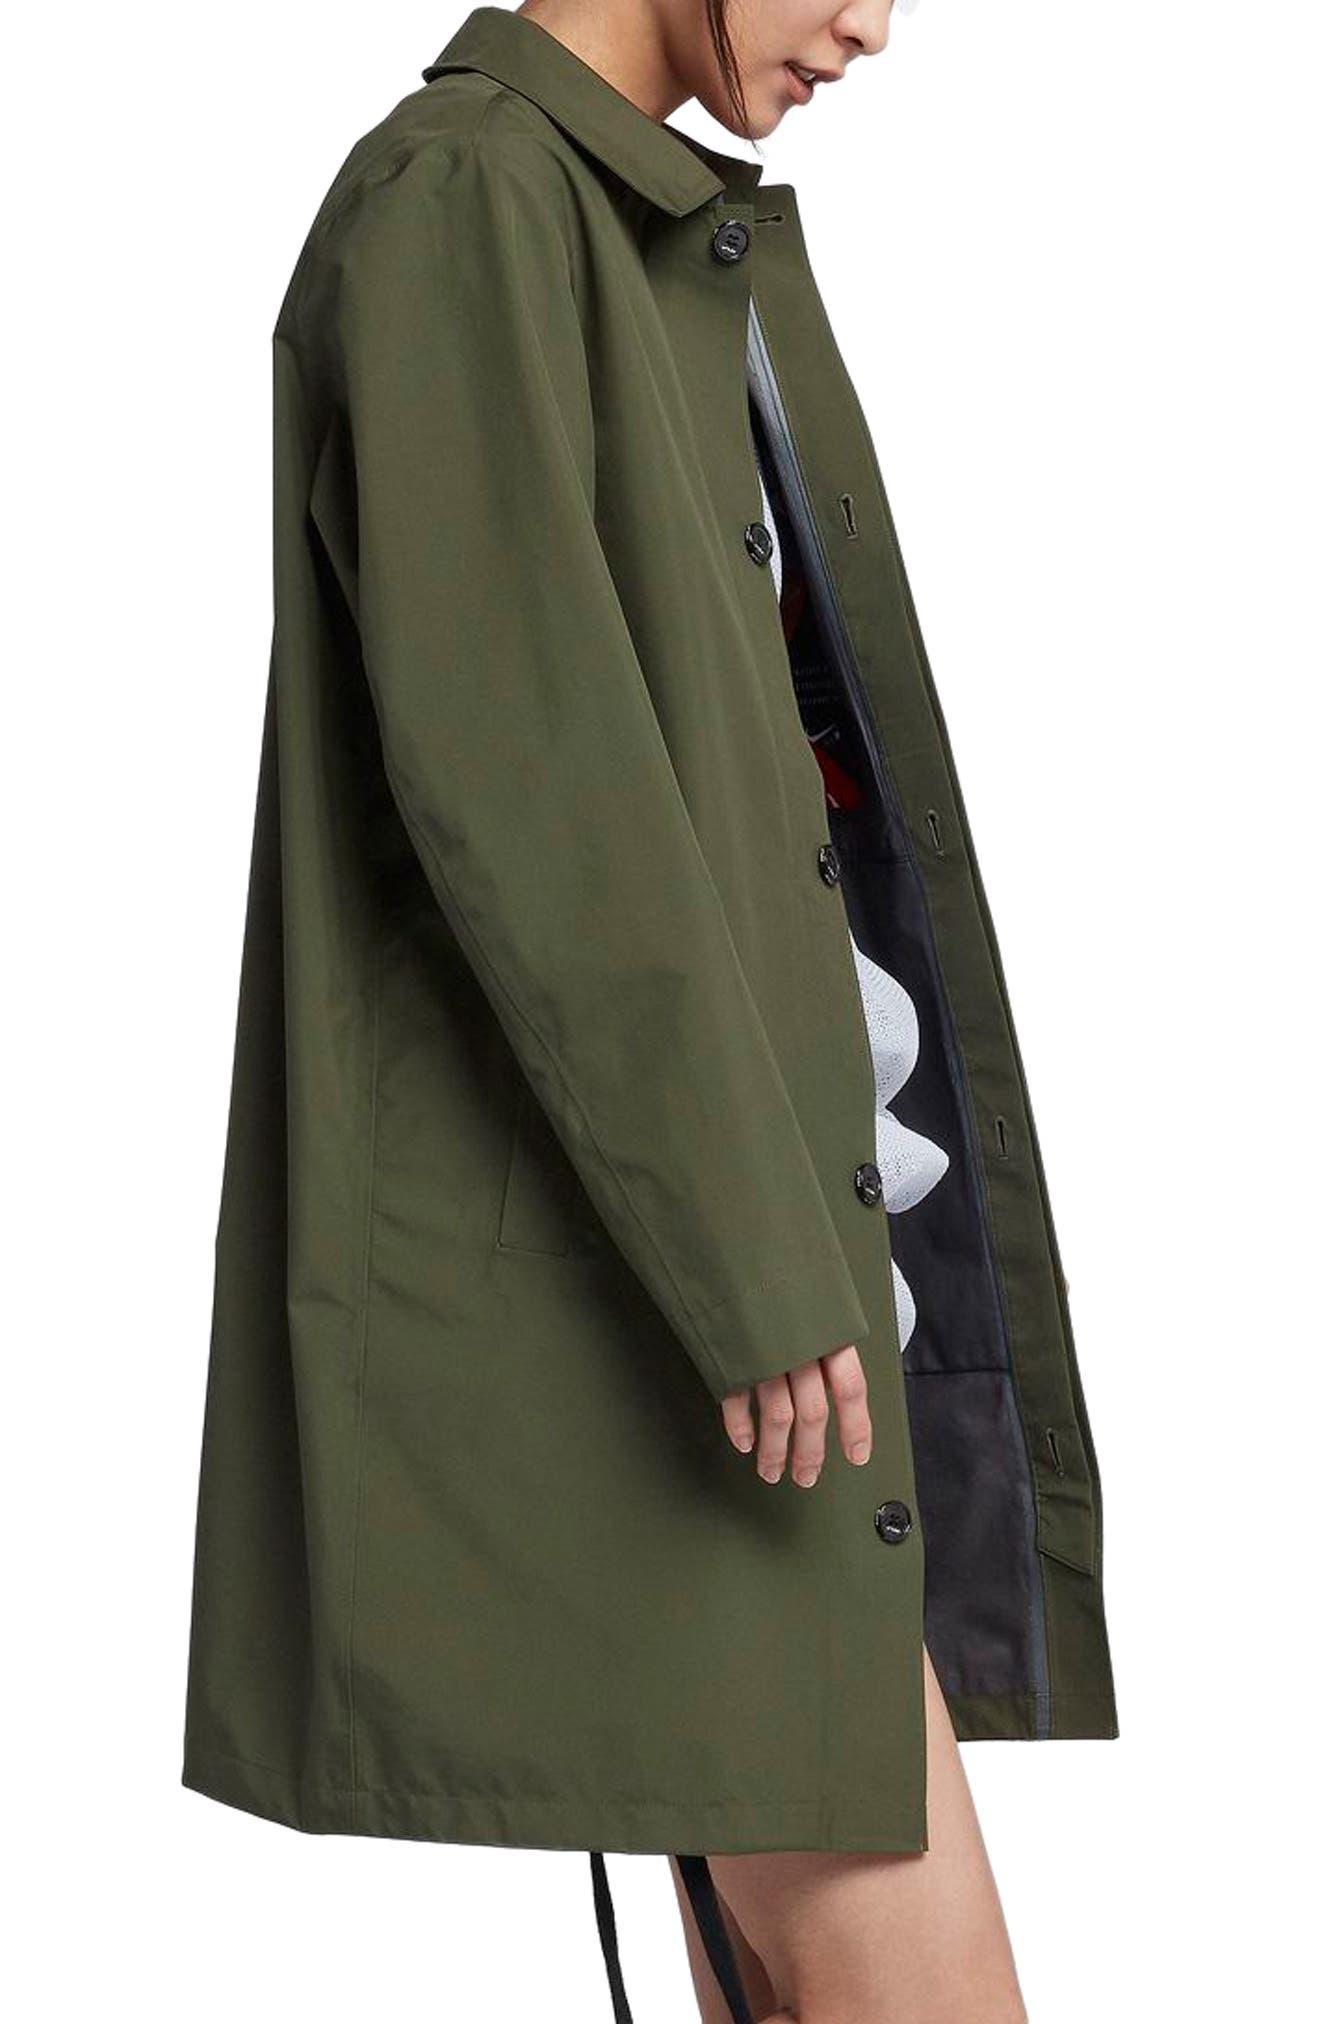 NikeLab x RT Women's Water Resistant Car Coat,                             Alternate thumbnail 2, color,                             Surplus Green